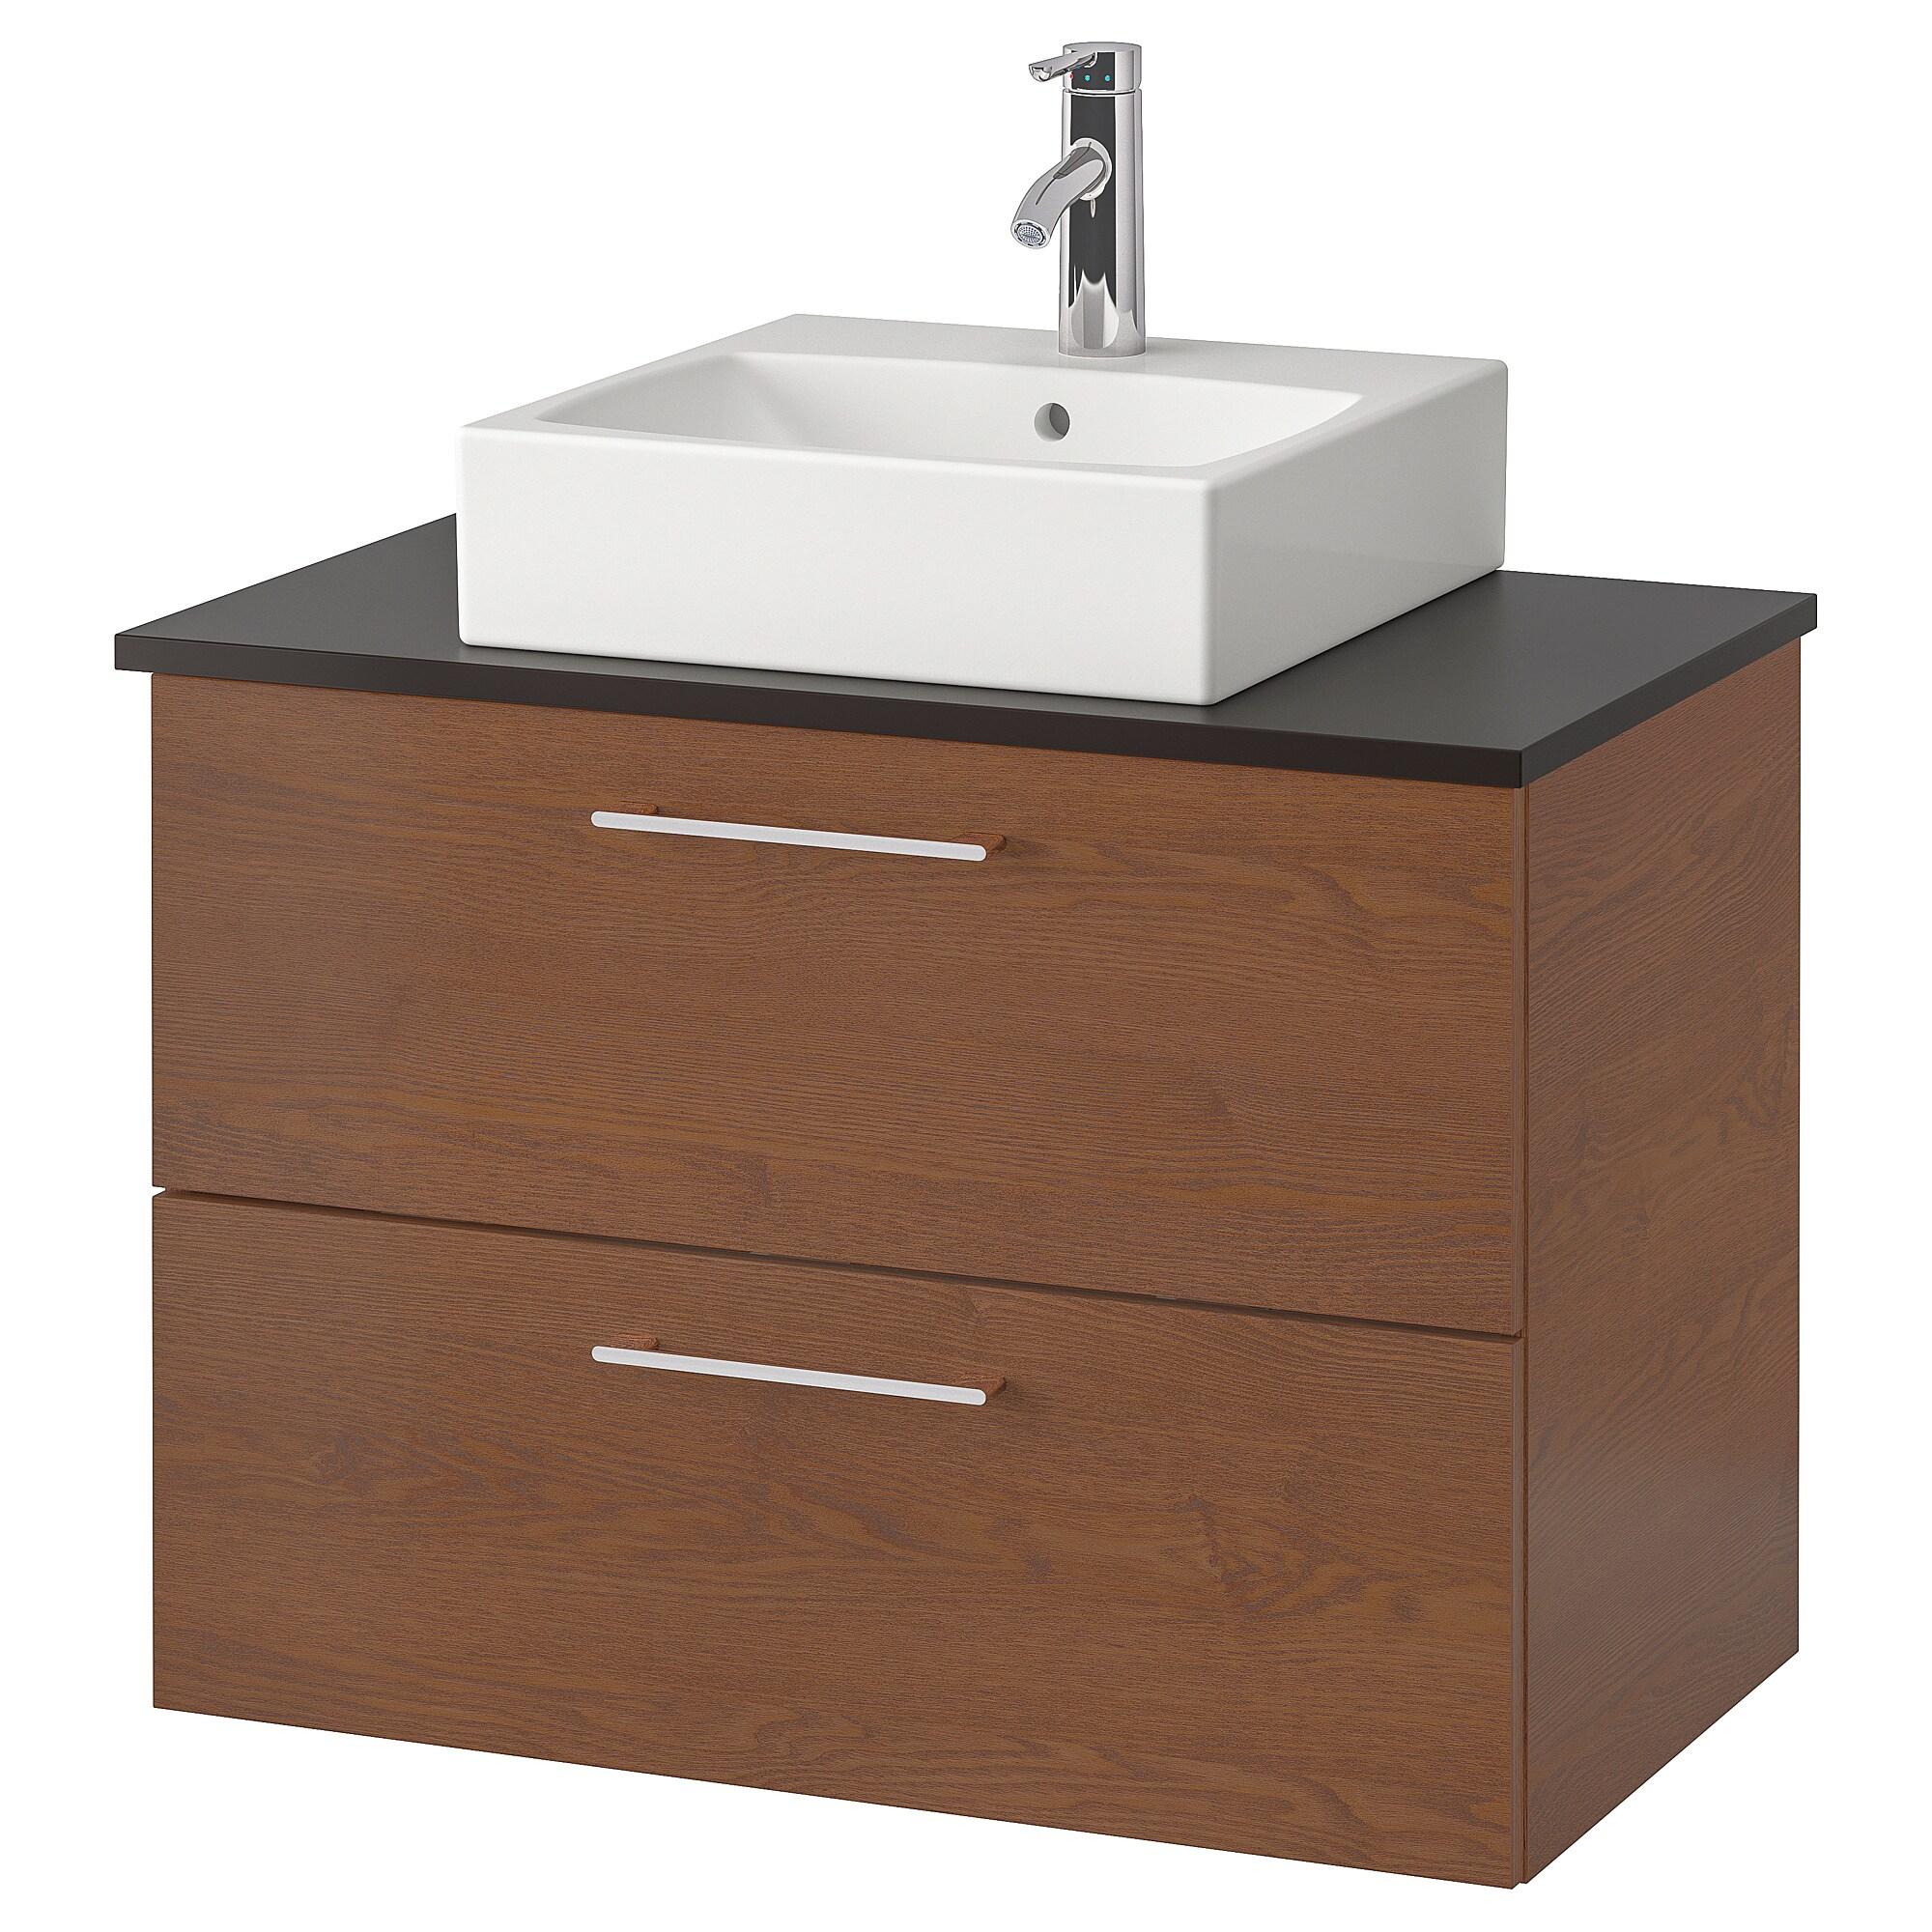 GODMORGON/TOLKEN / TÖRNVIKEN Mobile/lavabo 45x45/piano di ...